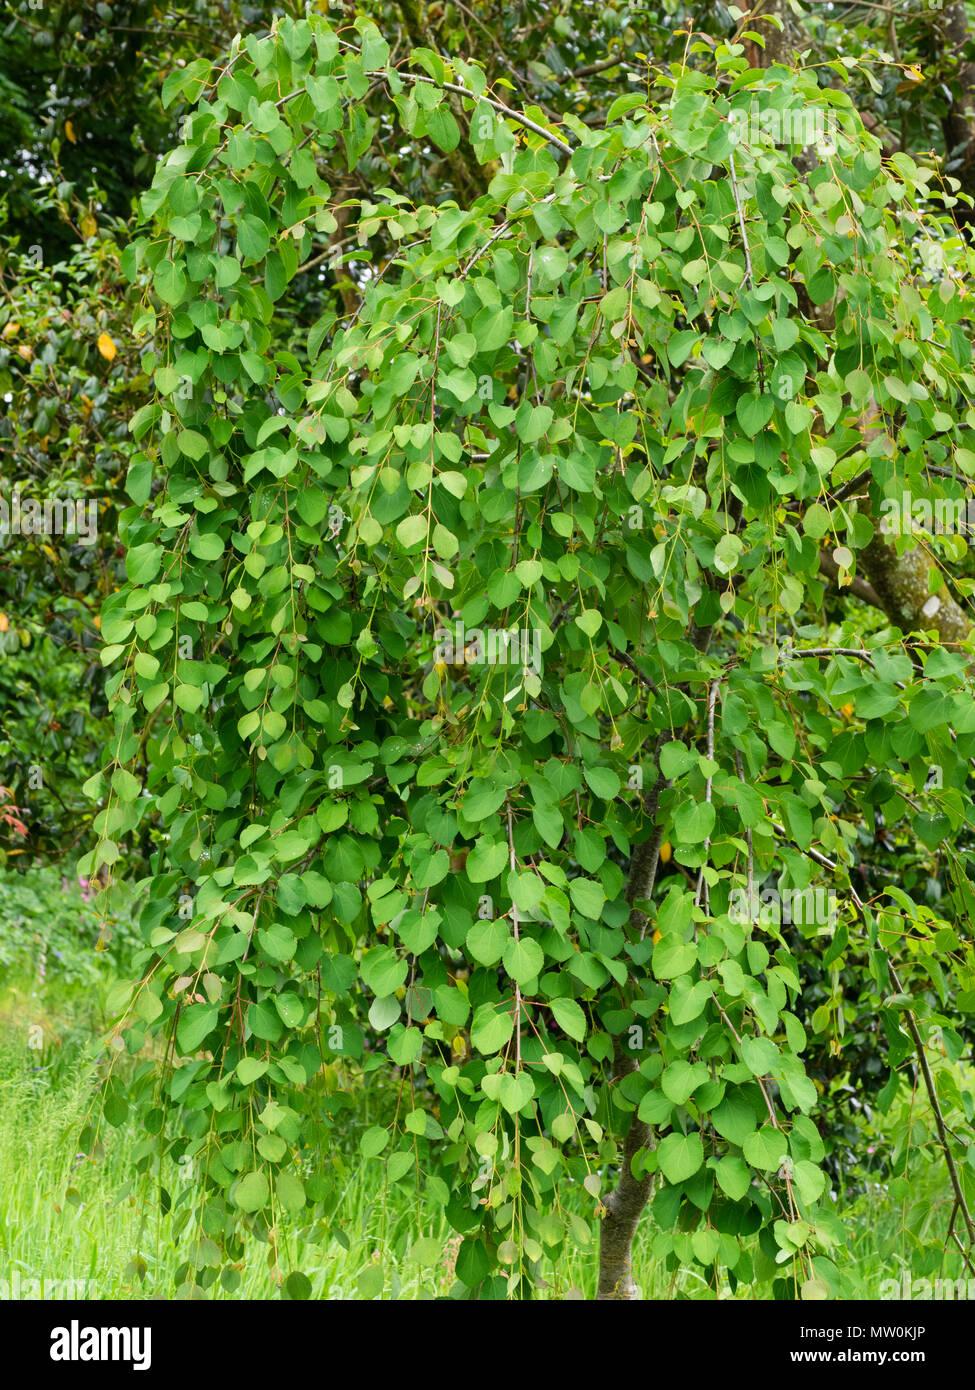 "Planta joven del llanto forma del árbol de Katsura, Cercidiphyllum japonicum ""Amazing Grace"" Imagen De Stock"